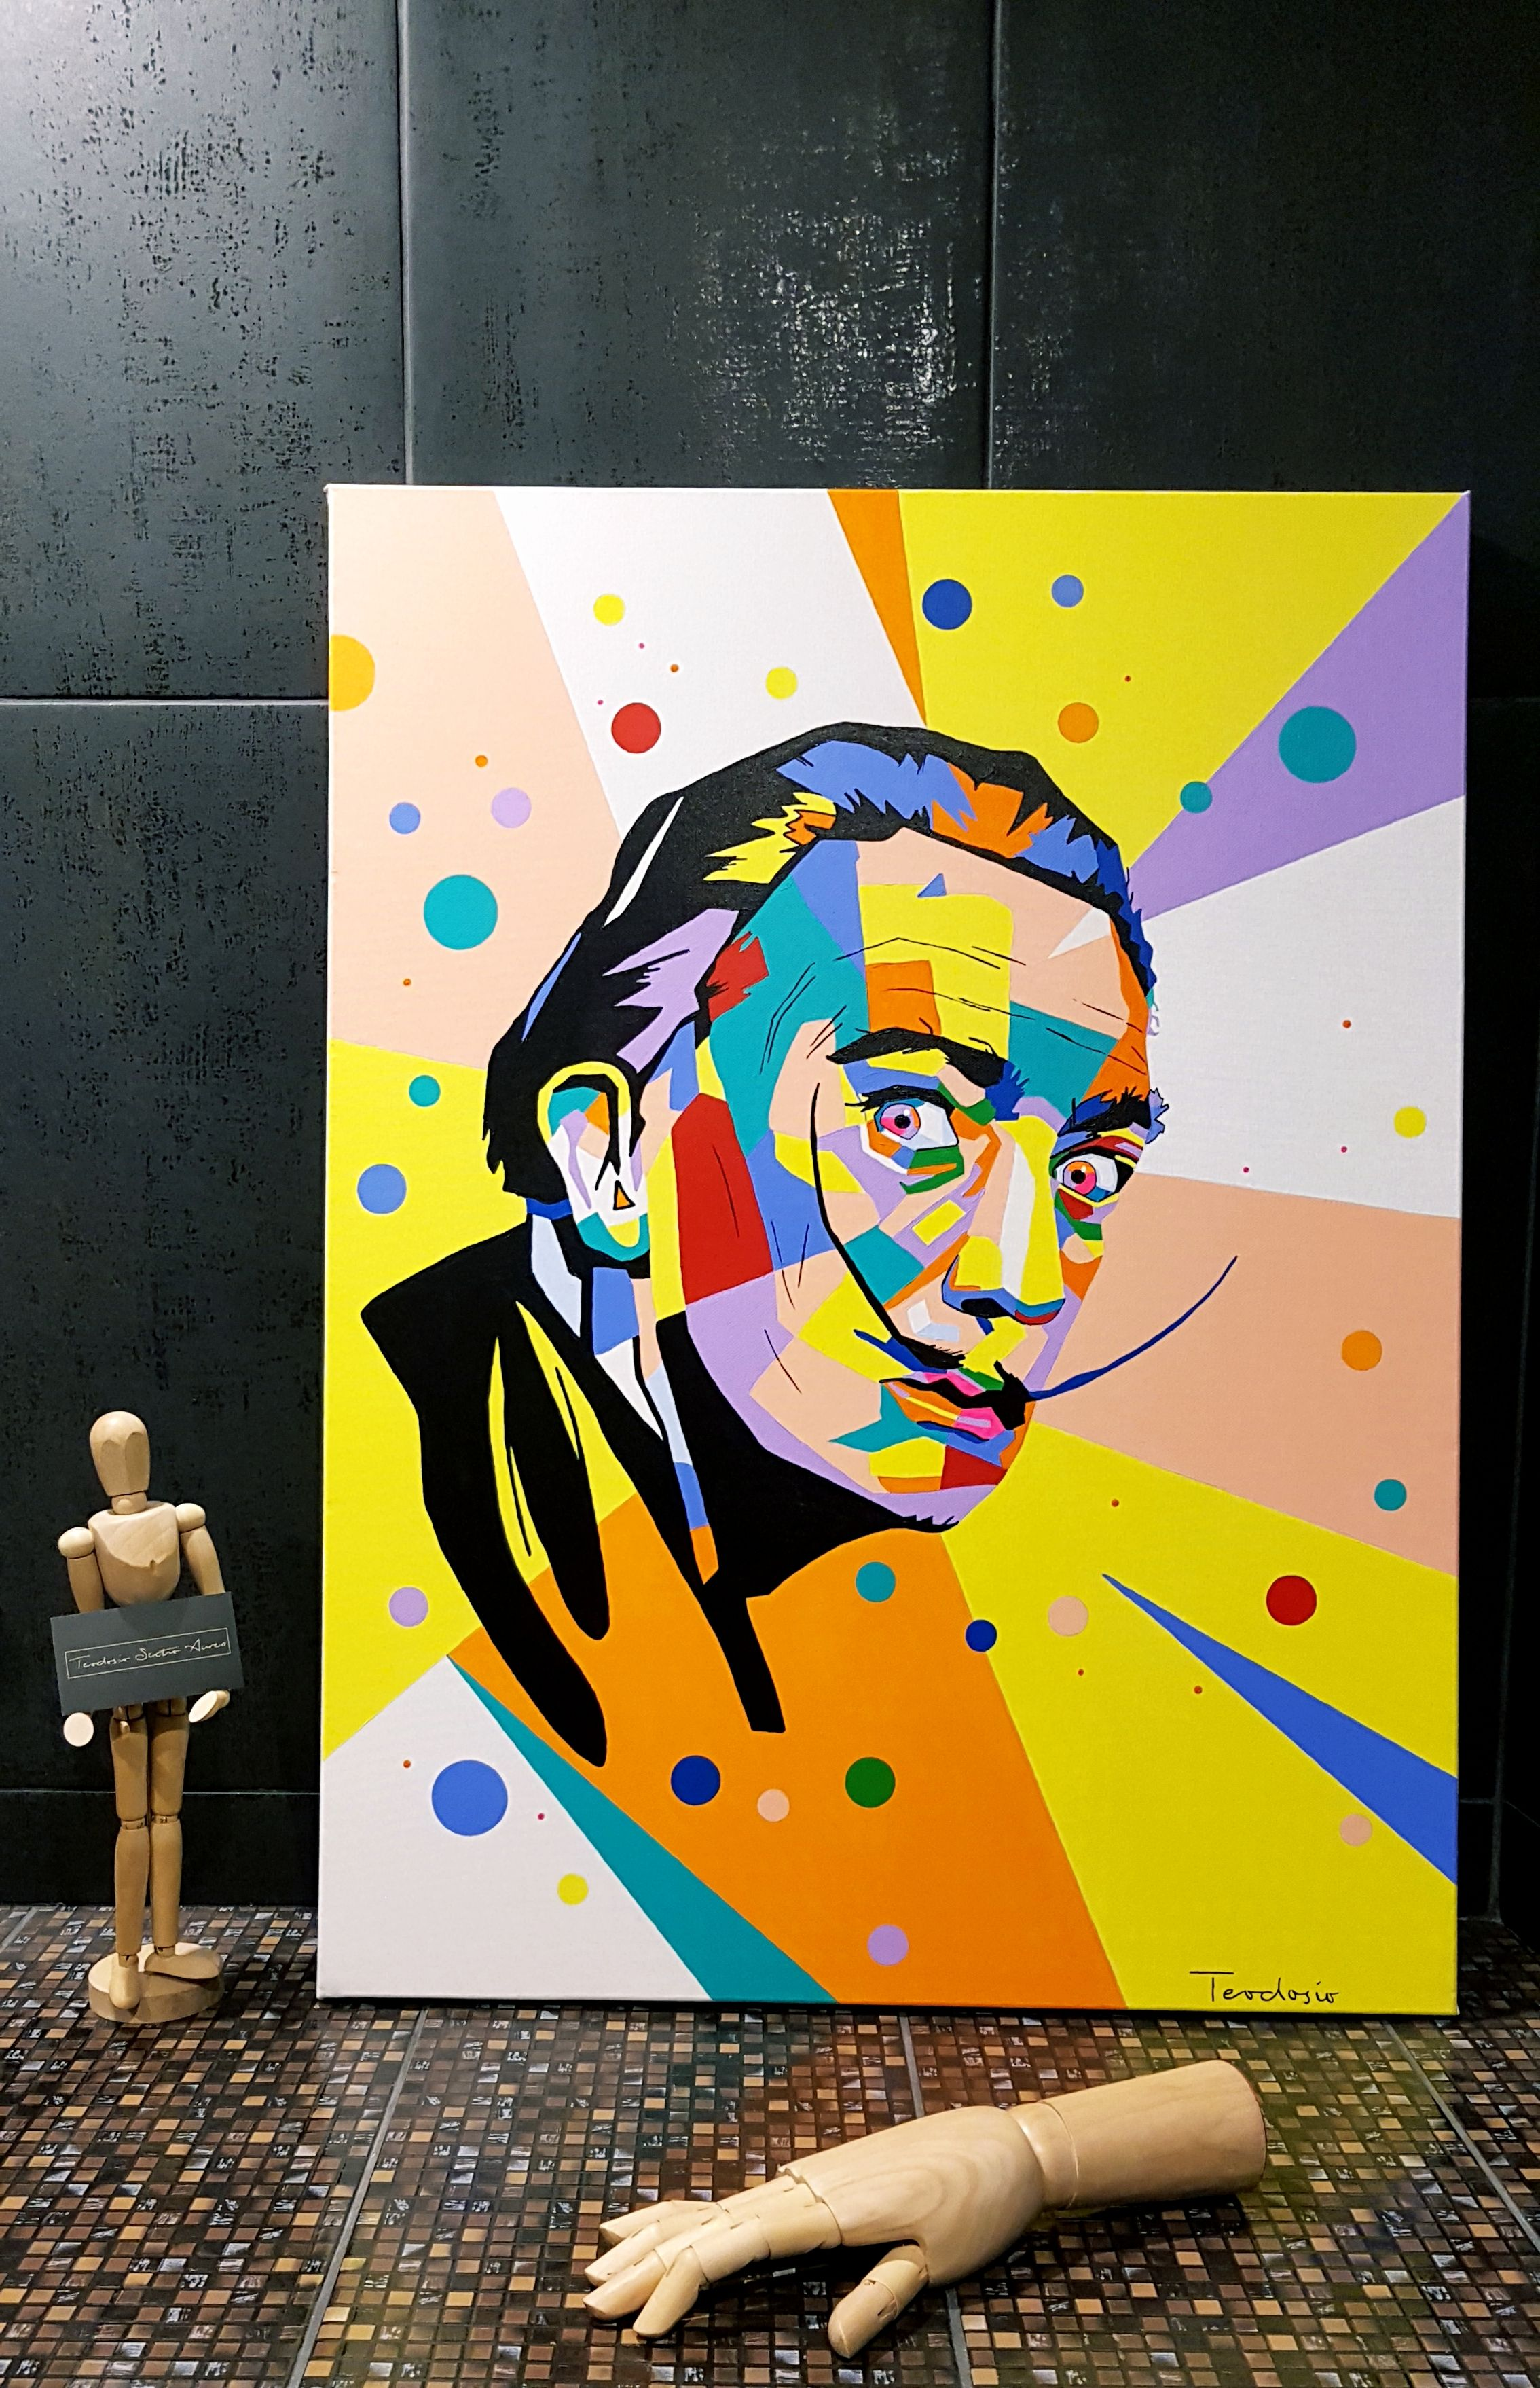 My new artwork ''Salvador Dali'' pop art - geomtery...  #teodosio #art #popart #dali #salvadordali #teodosiosectioaurea #myart